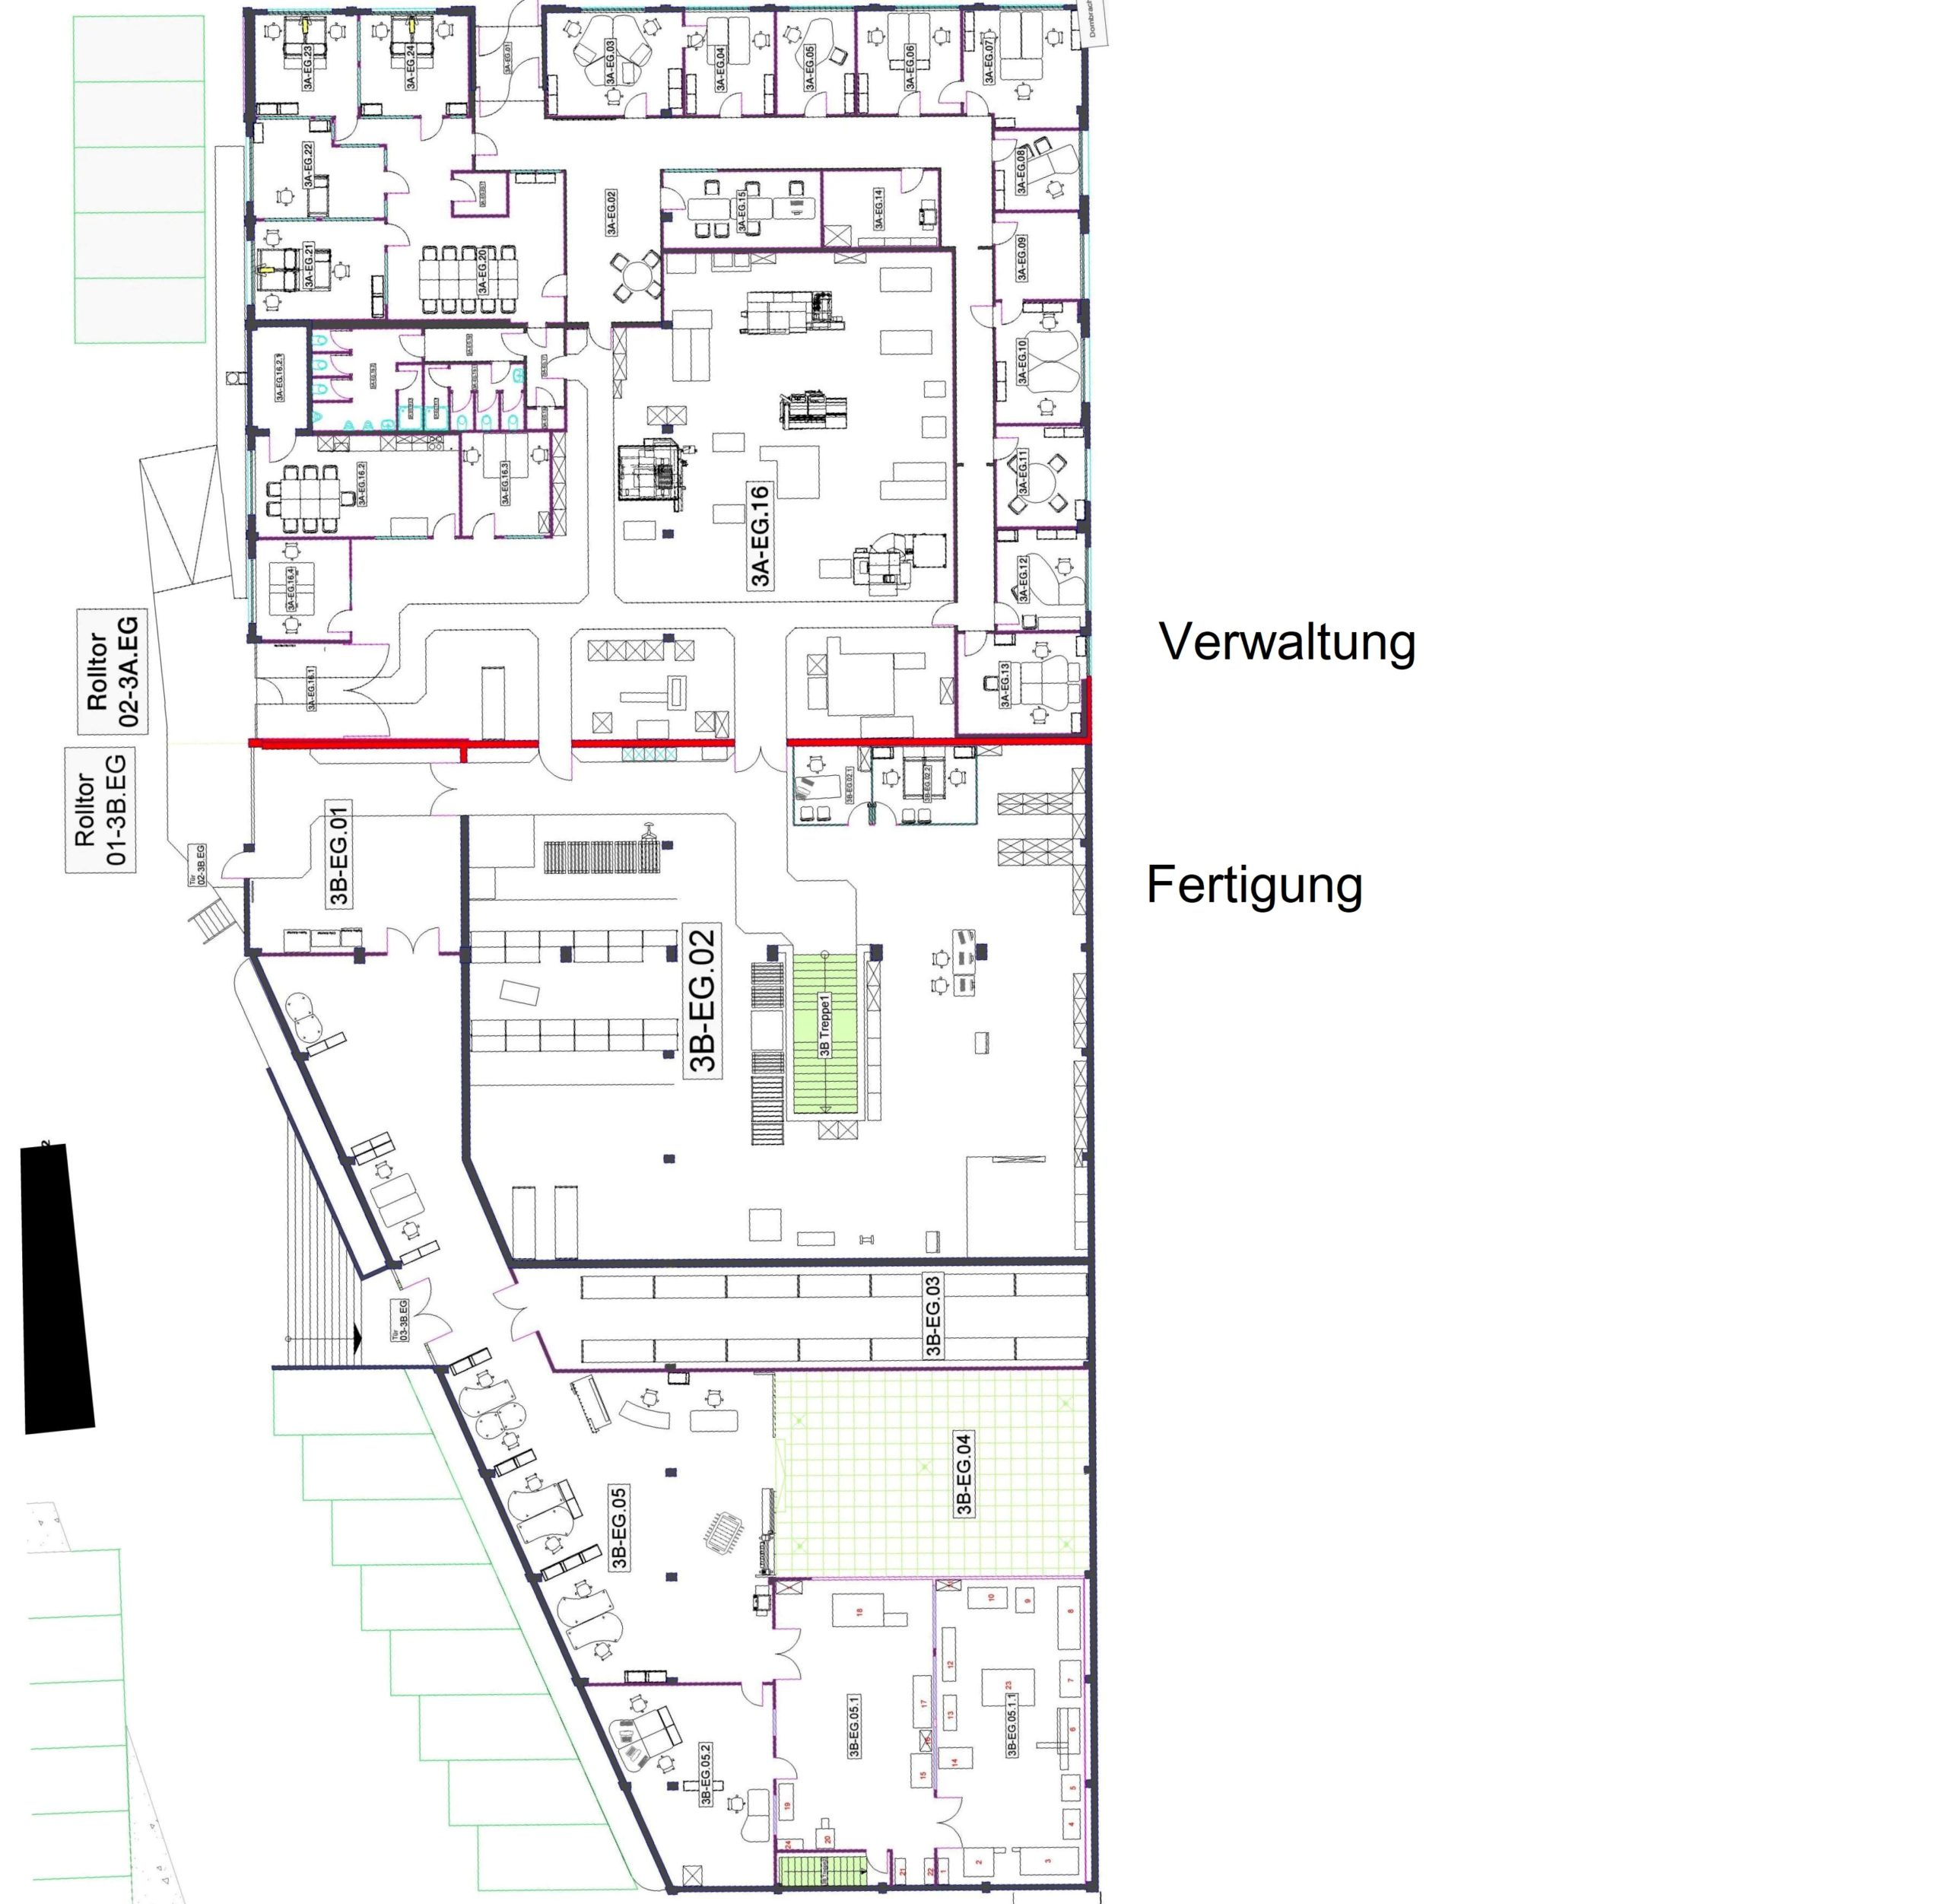 Grundriss Erdgeschoss editiert durch WZ-Immobilien. Immobilienmakler in Iserlohn und dem Märkischen kreis